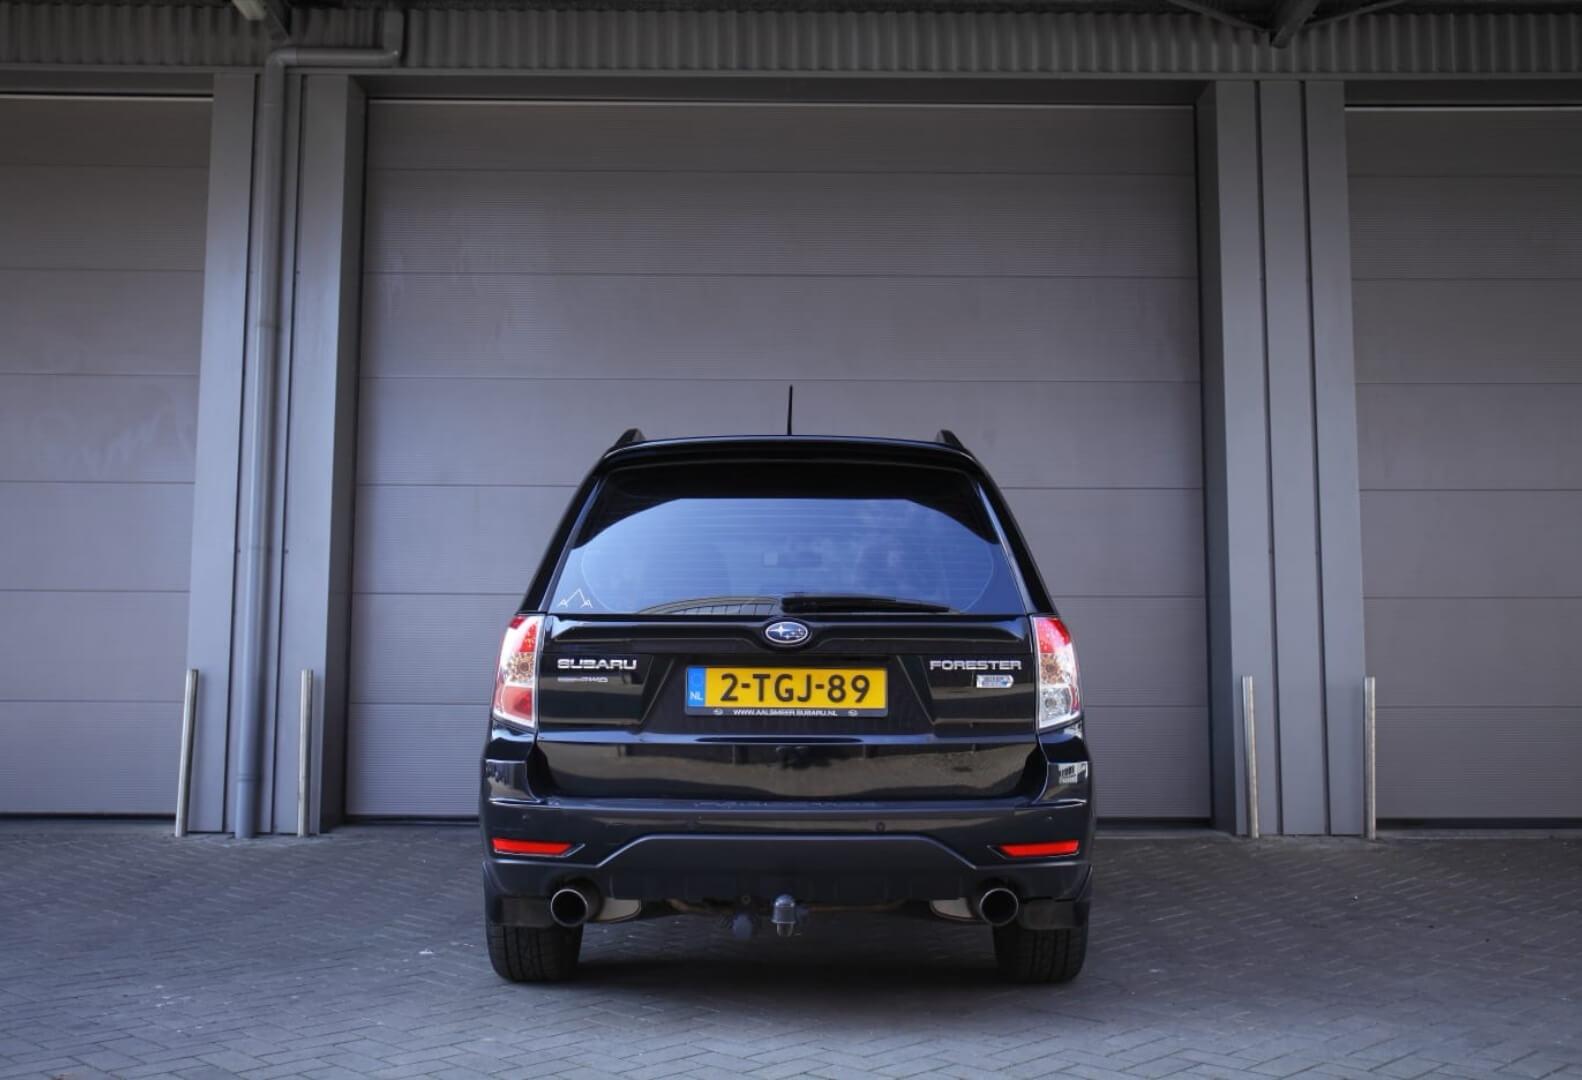 Subaru Forester back – by Next Level Automotive – Go to nextlevelautomotive.eu